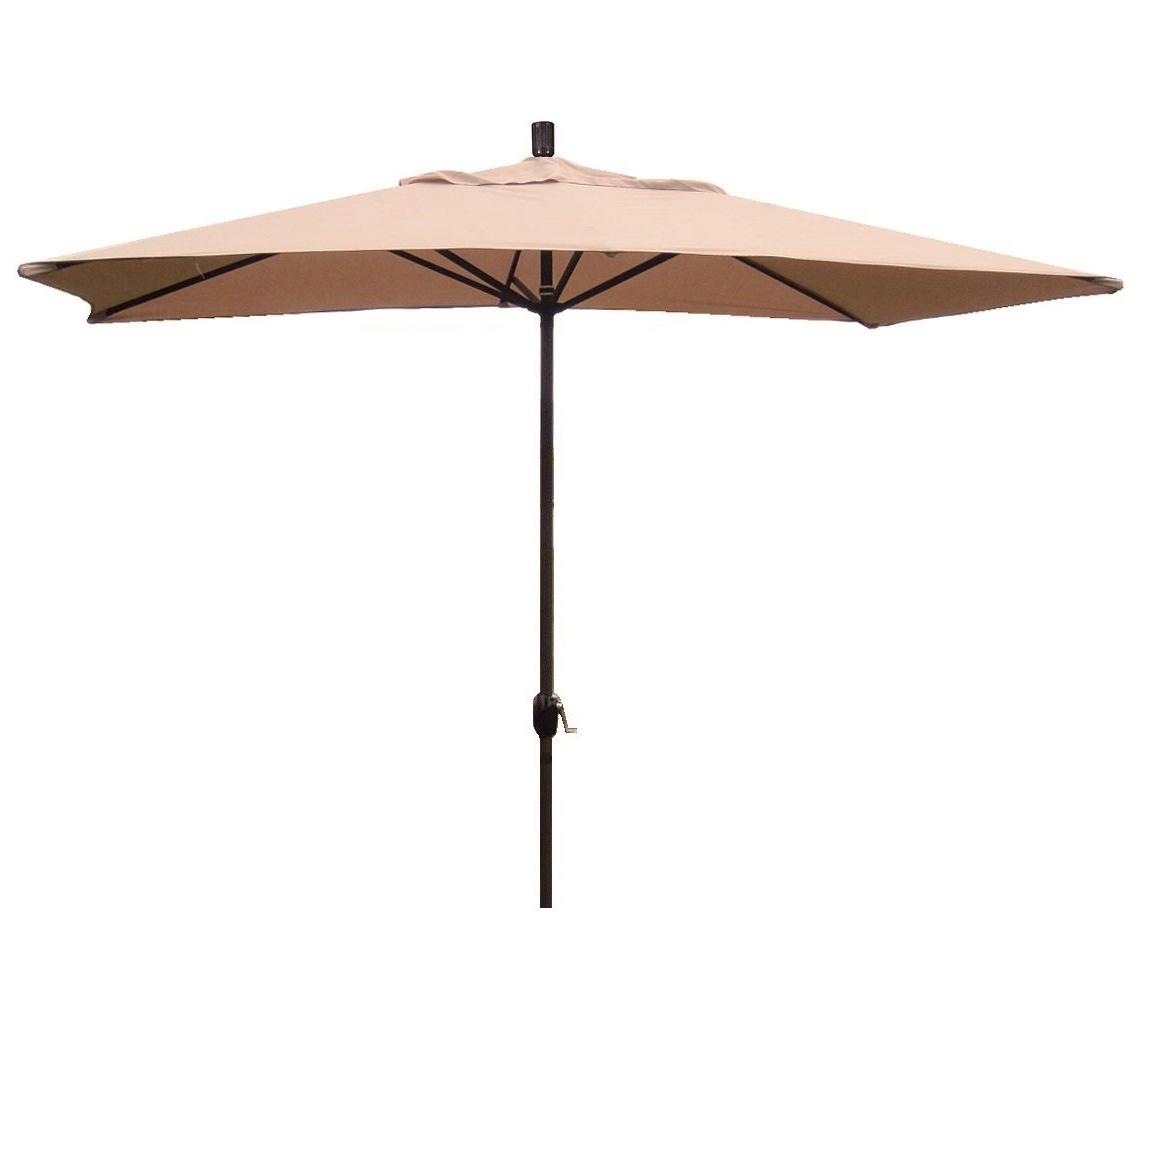 Dena Rectangular Market Umbrellas With Regard To Favorite Grieve 10' X 6' Rectangular Market Umbrella (View 8 of 20)